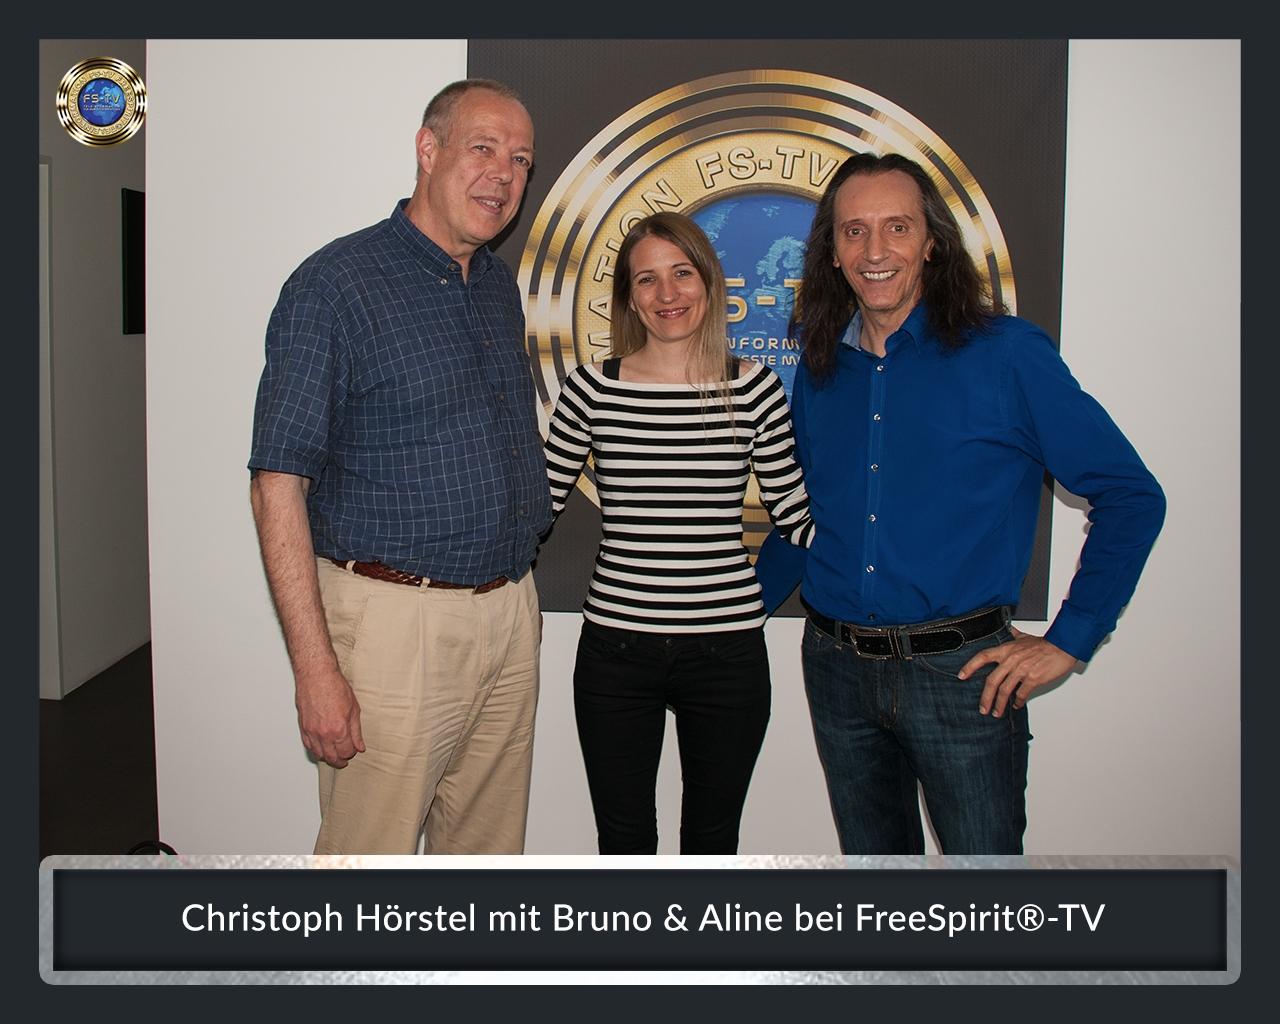 FS-TV-Bildergallerie-Hörstel 7